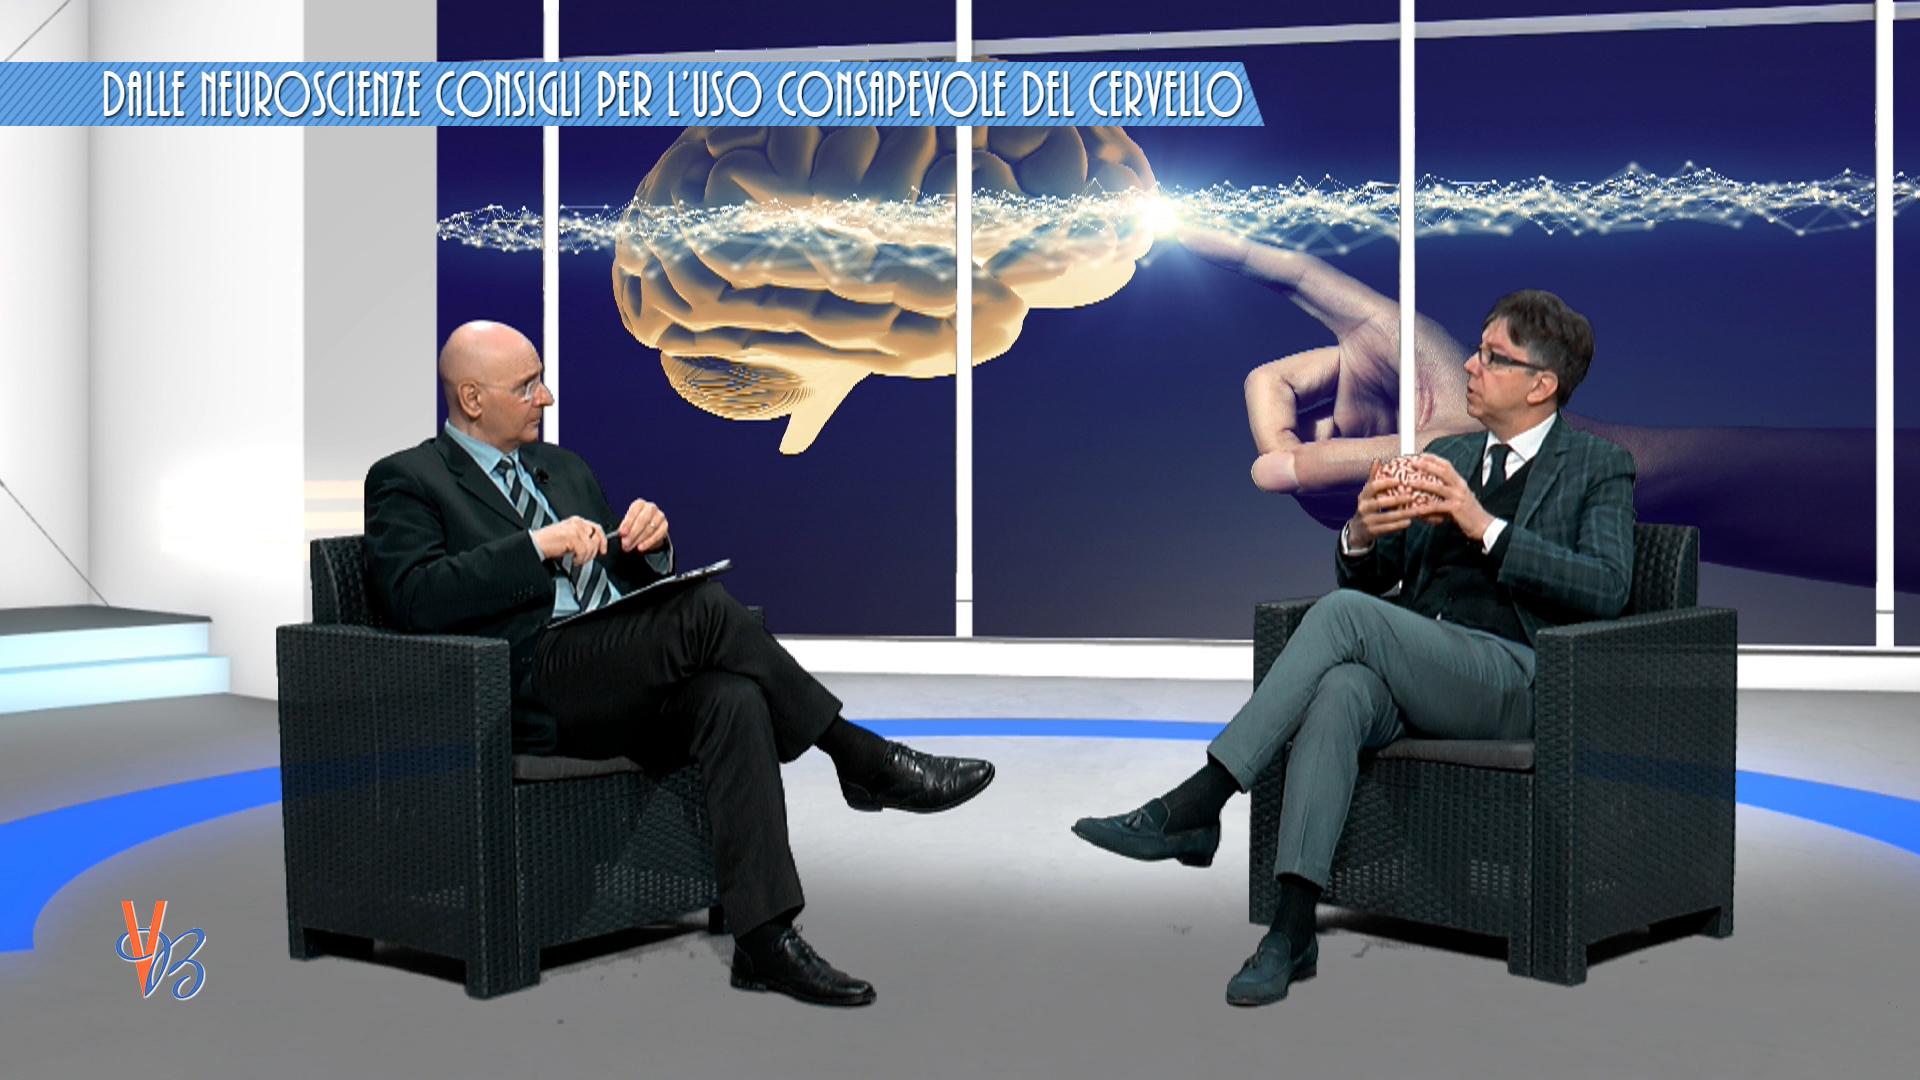 Interviste e rassegna stampa